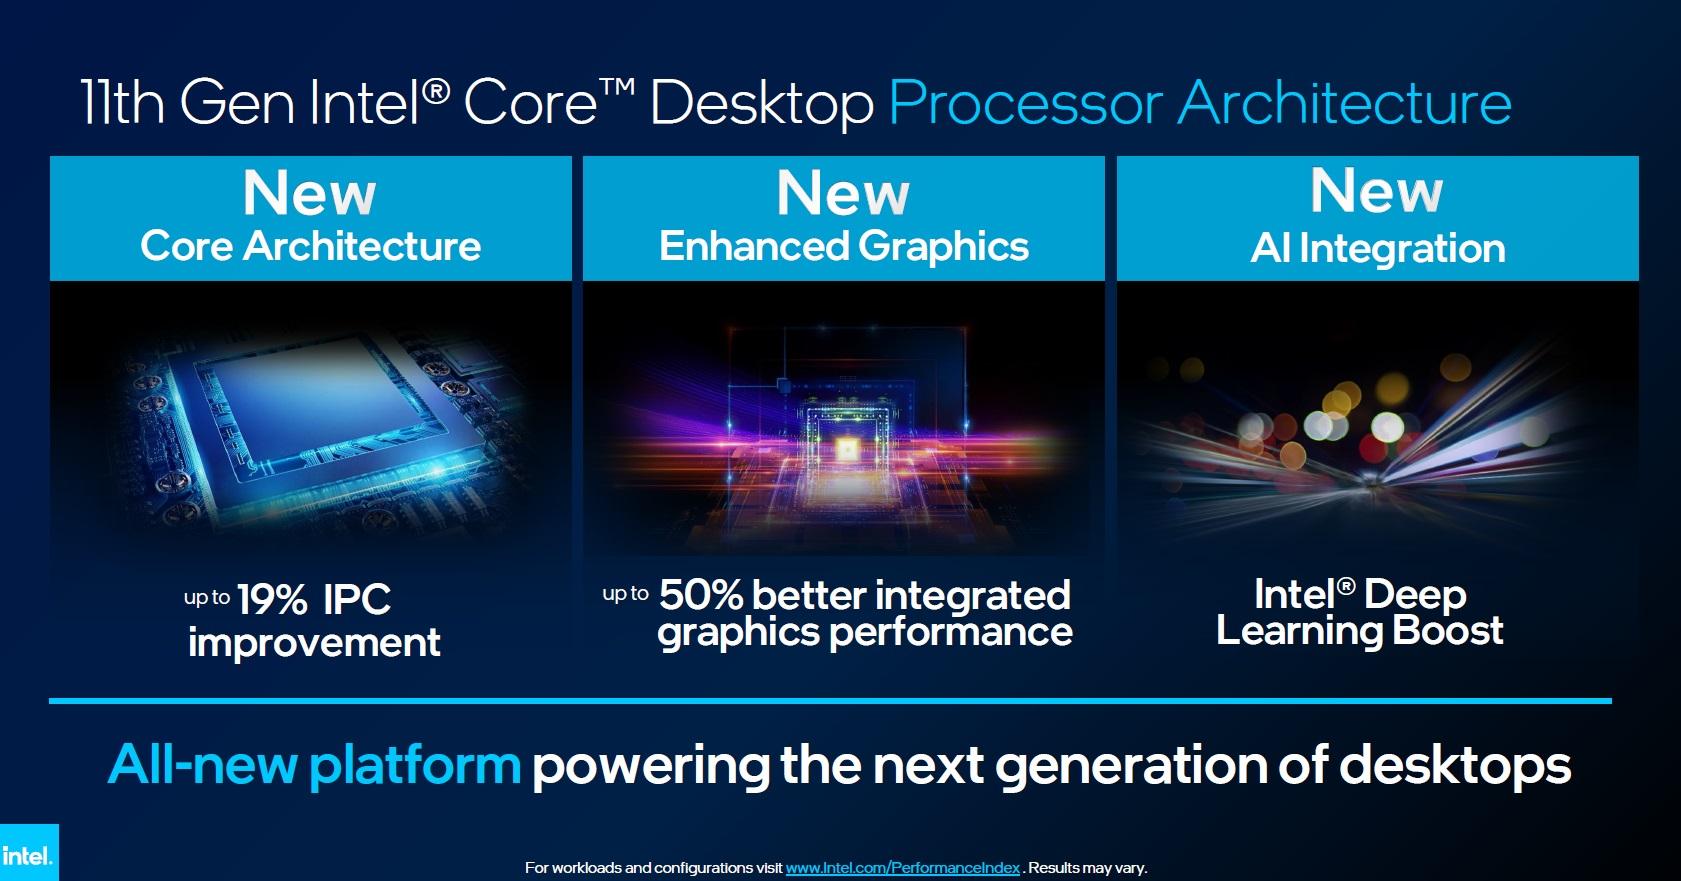 Menjajal Prosesor Intel Generasi ke-11 Core i9-11900K